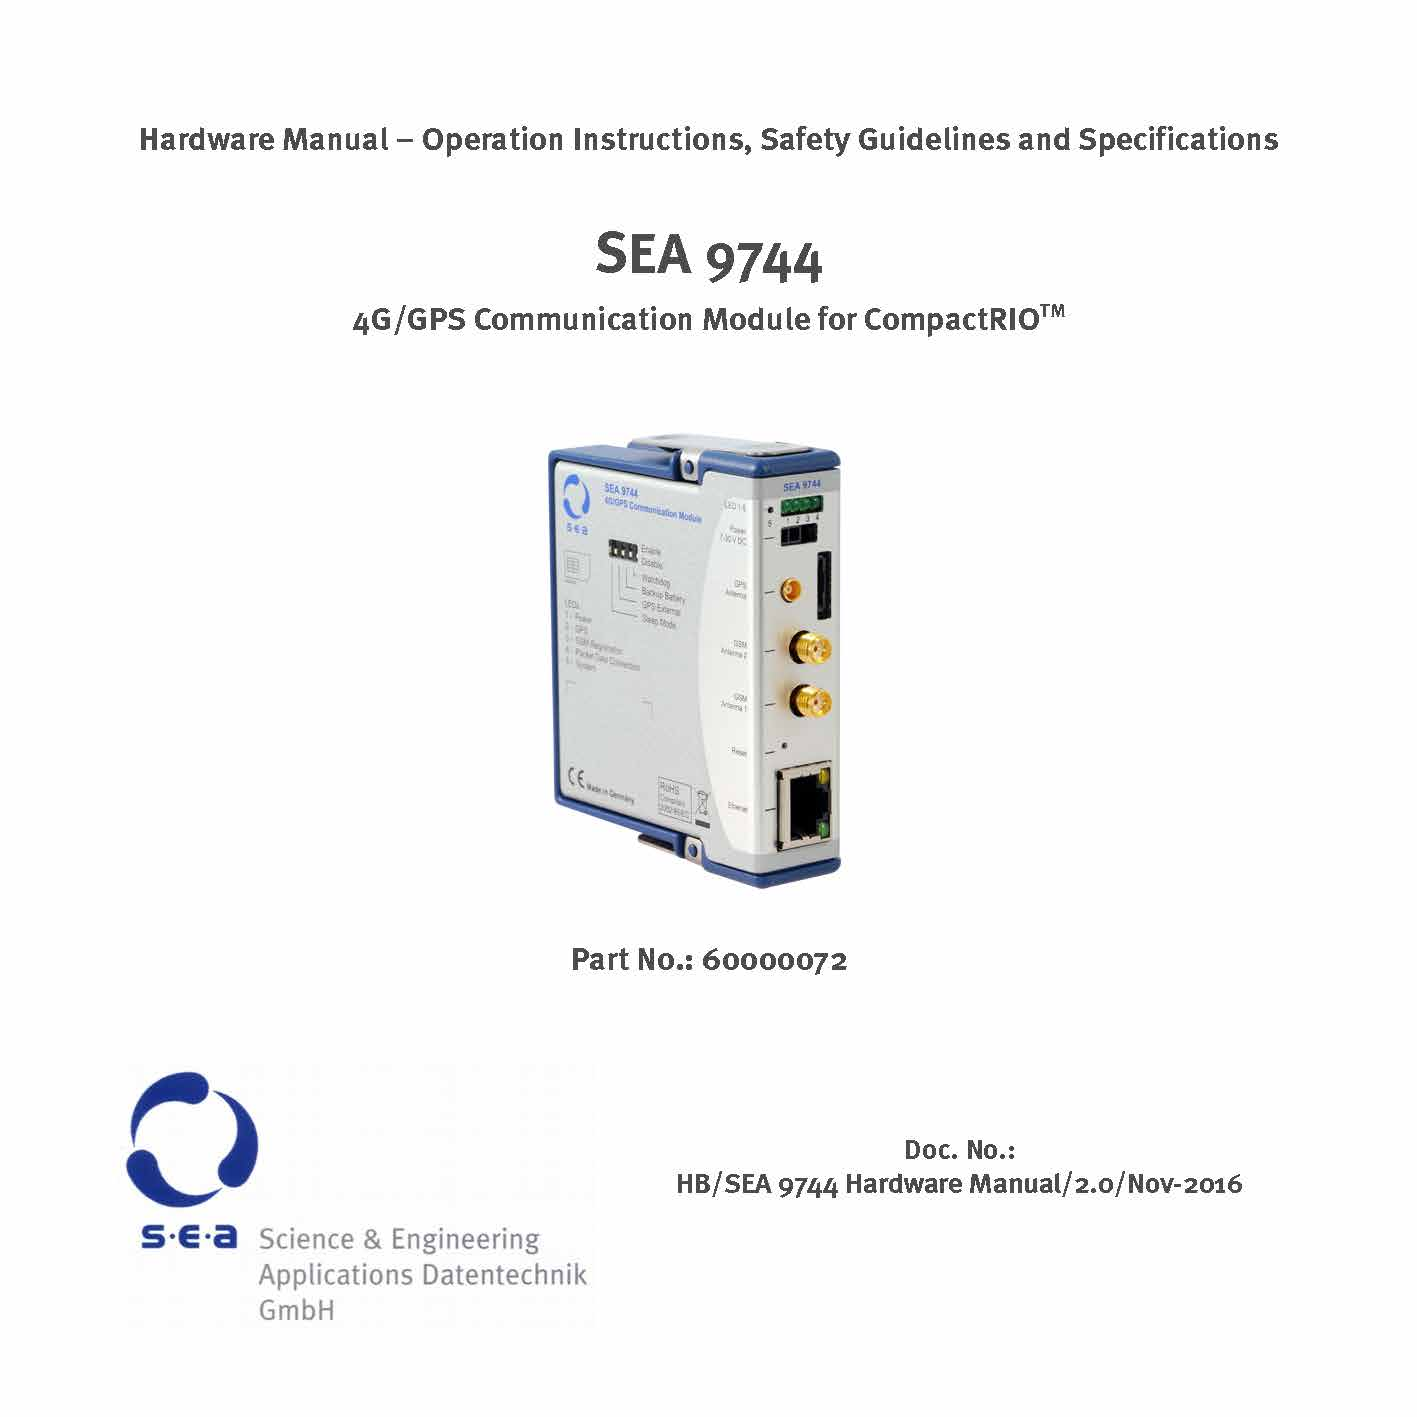 SEA 9744 4G Mobile Communication Module - Kit